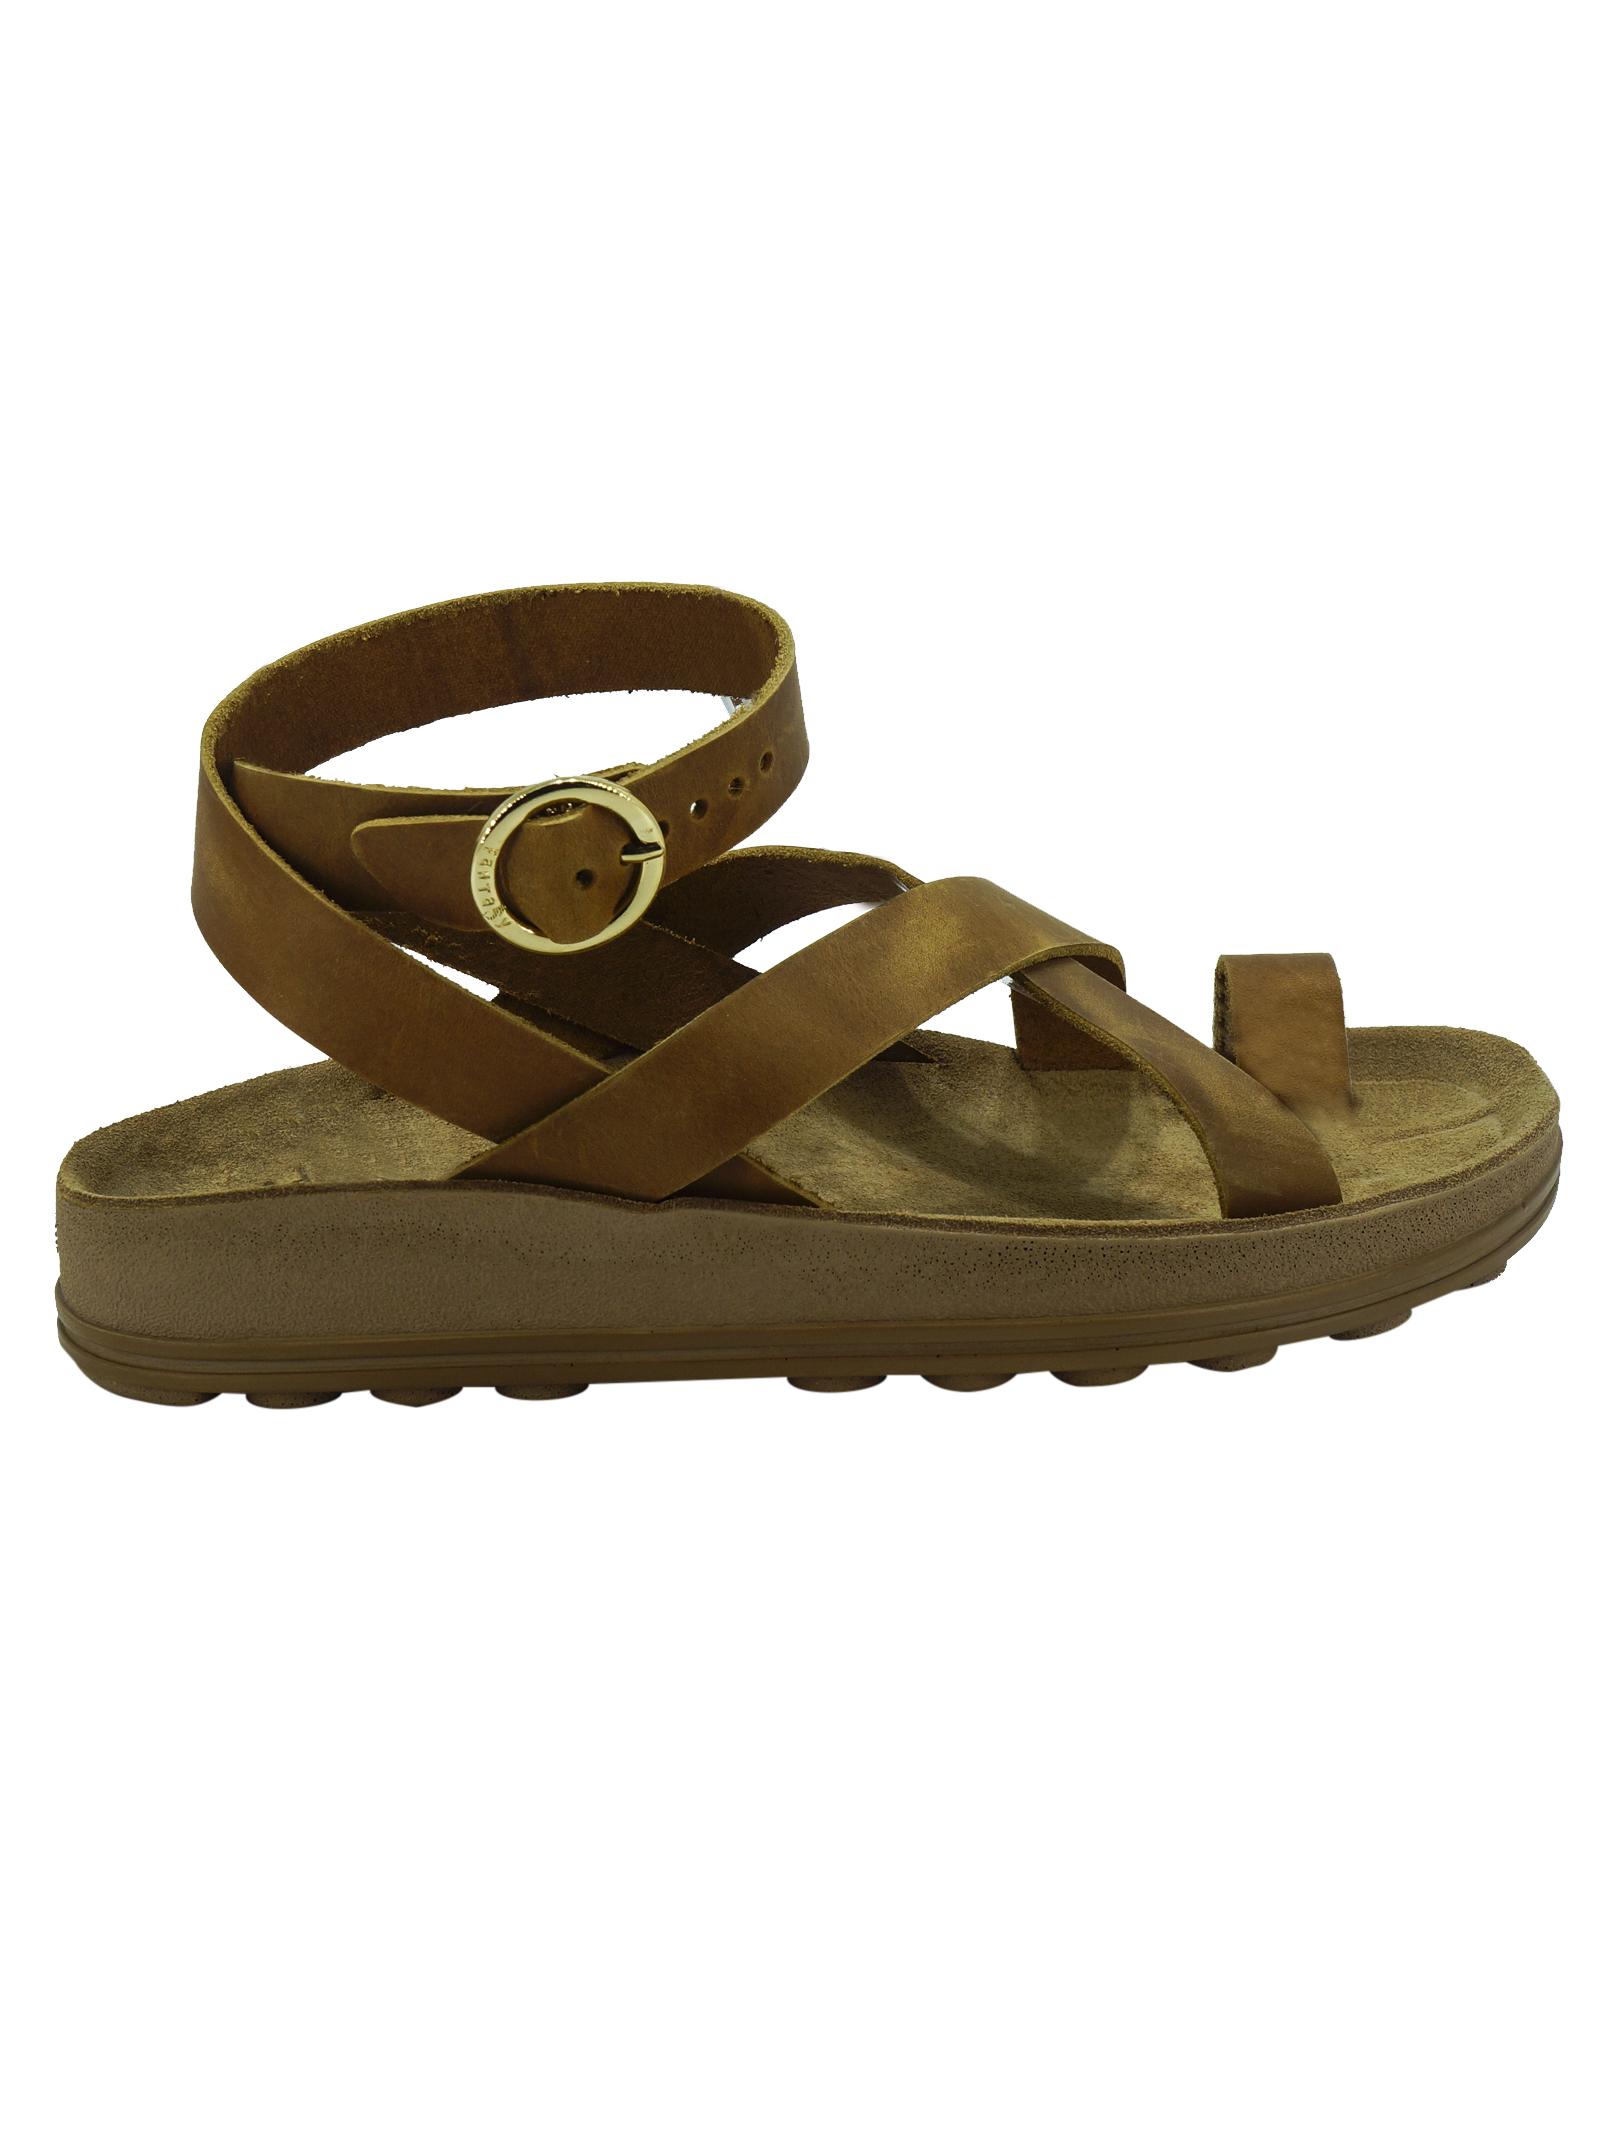 Sandali Infradito Donna Plantare Fantasy Sandals FANTASY SANDALS   Sandali   S315TAUPE